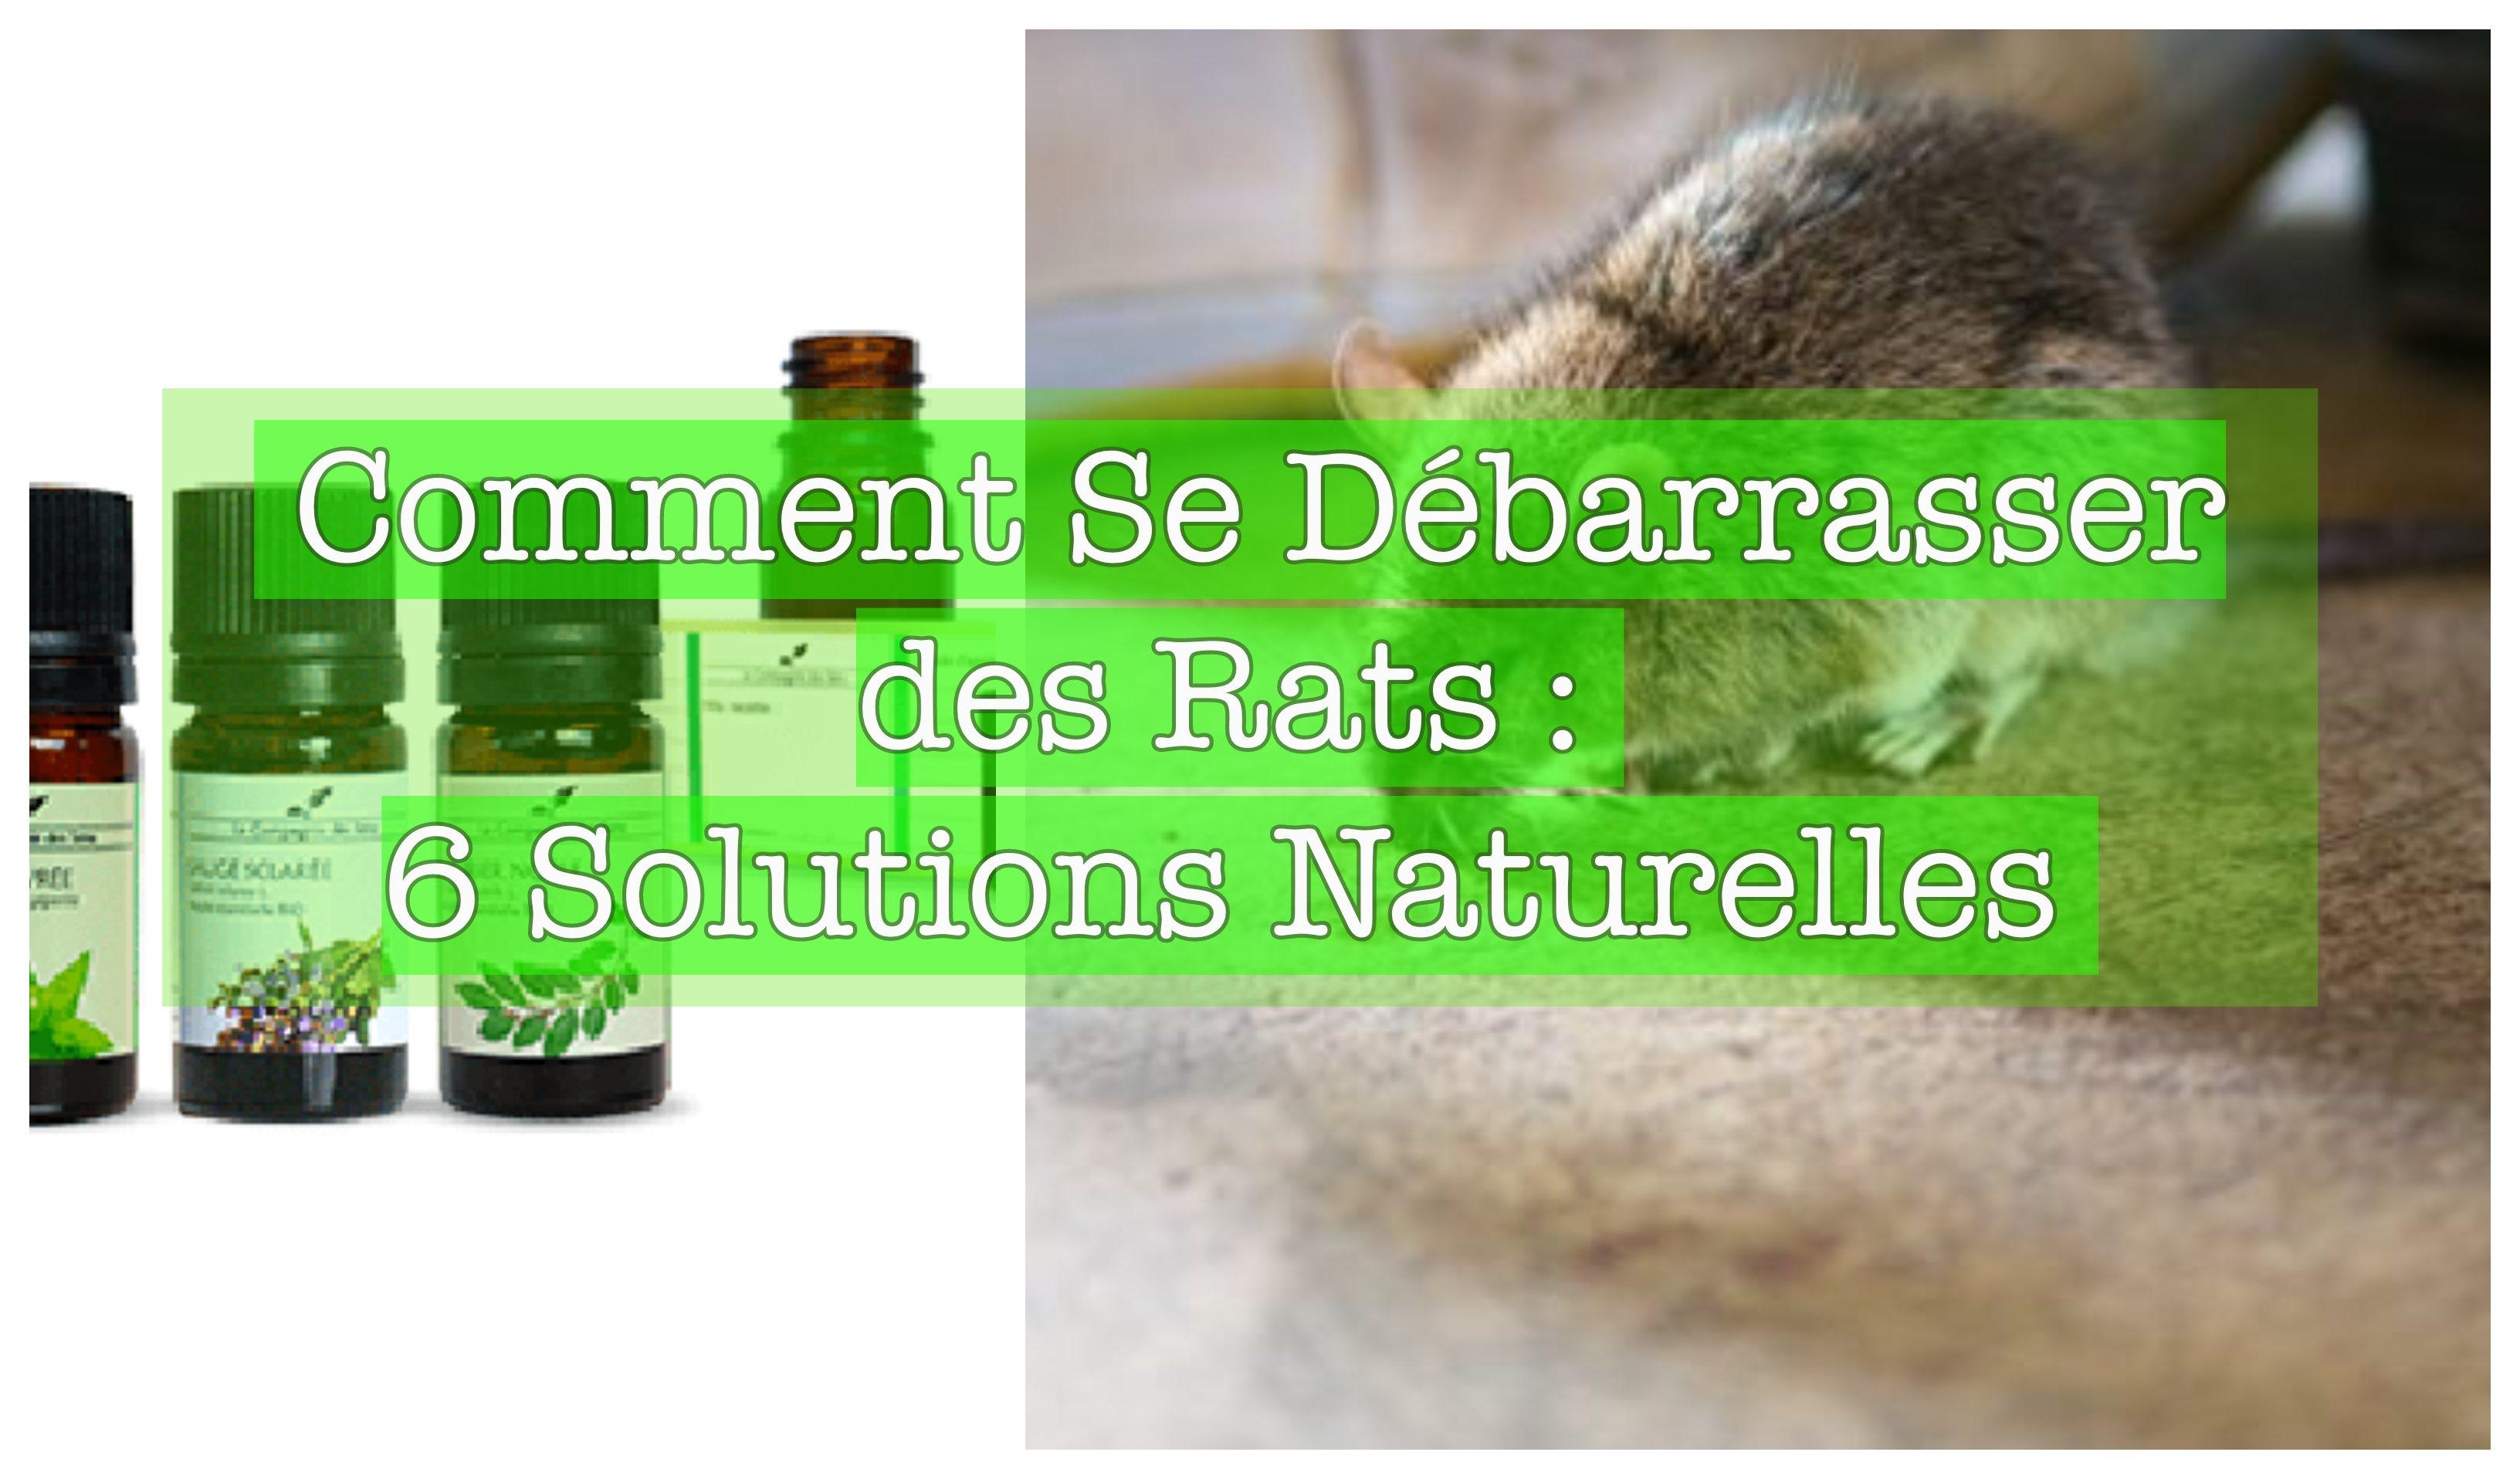 comment se d barrasser des rats 6 solutions naturelles. Black Bedroom Furniture Sets. Home Design Ideas